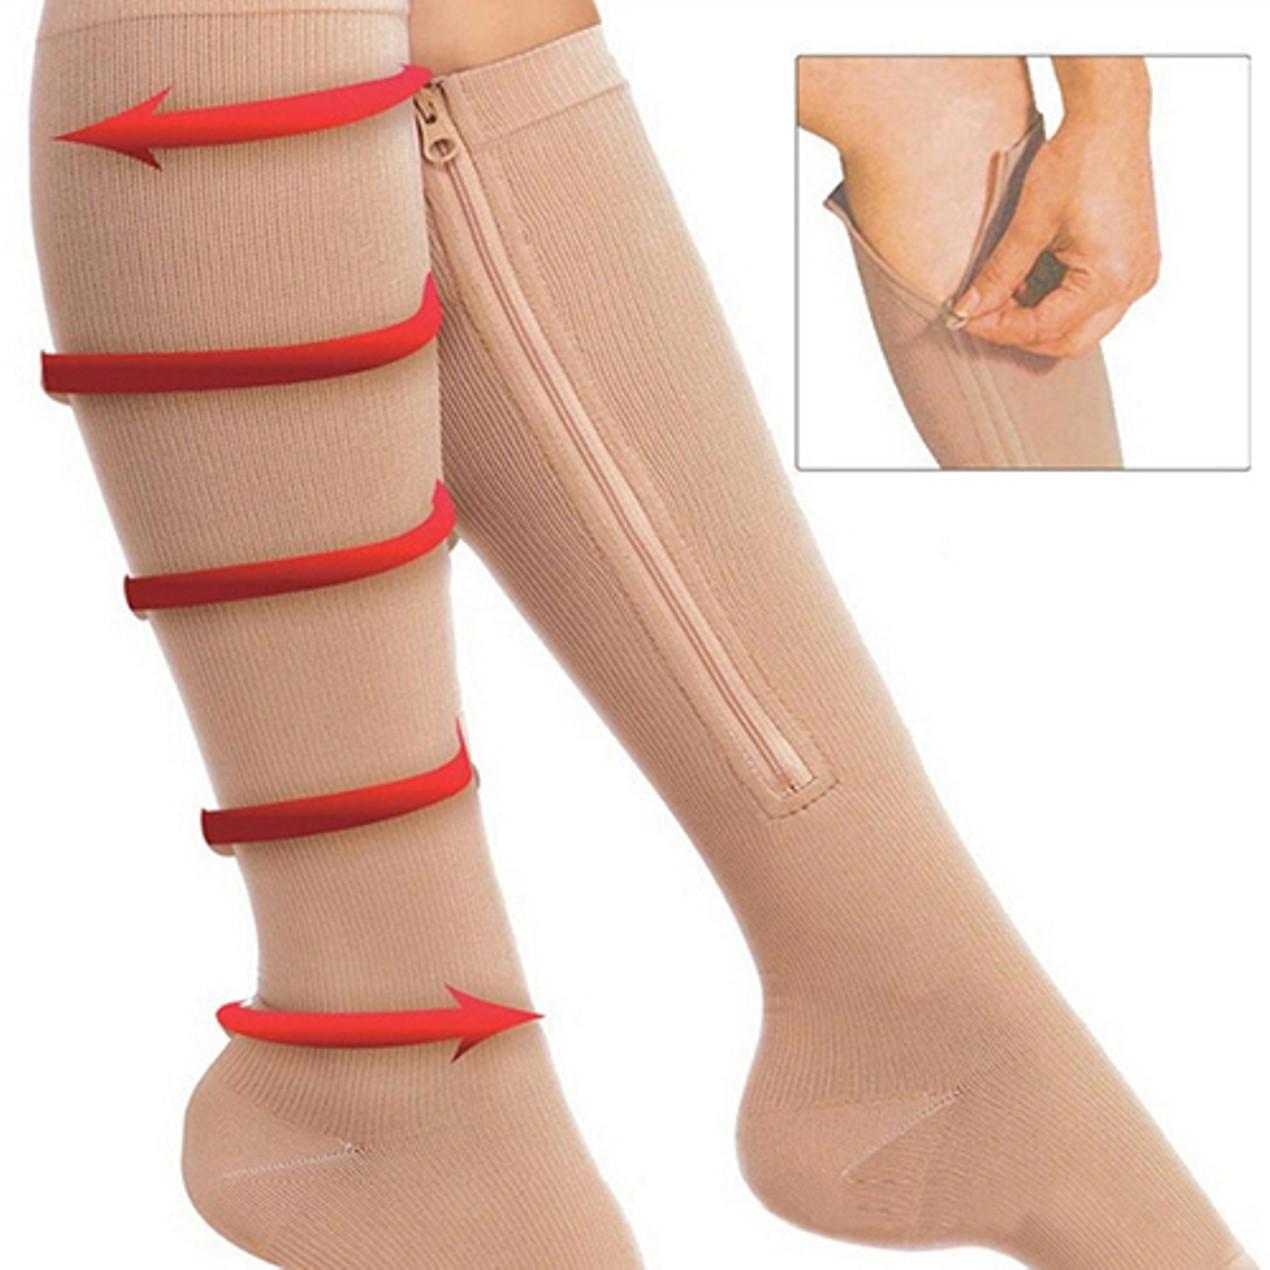 d5a4d0ee25 Open Toe Knee High Anti-Fatigue Zip Leg Compression Support Socks ...